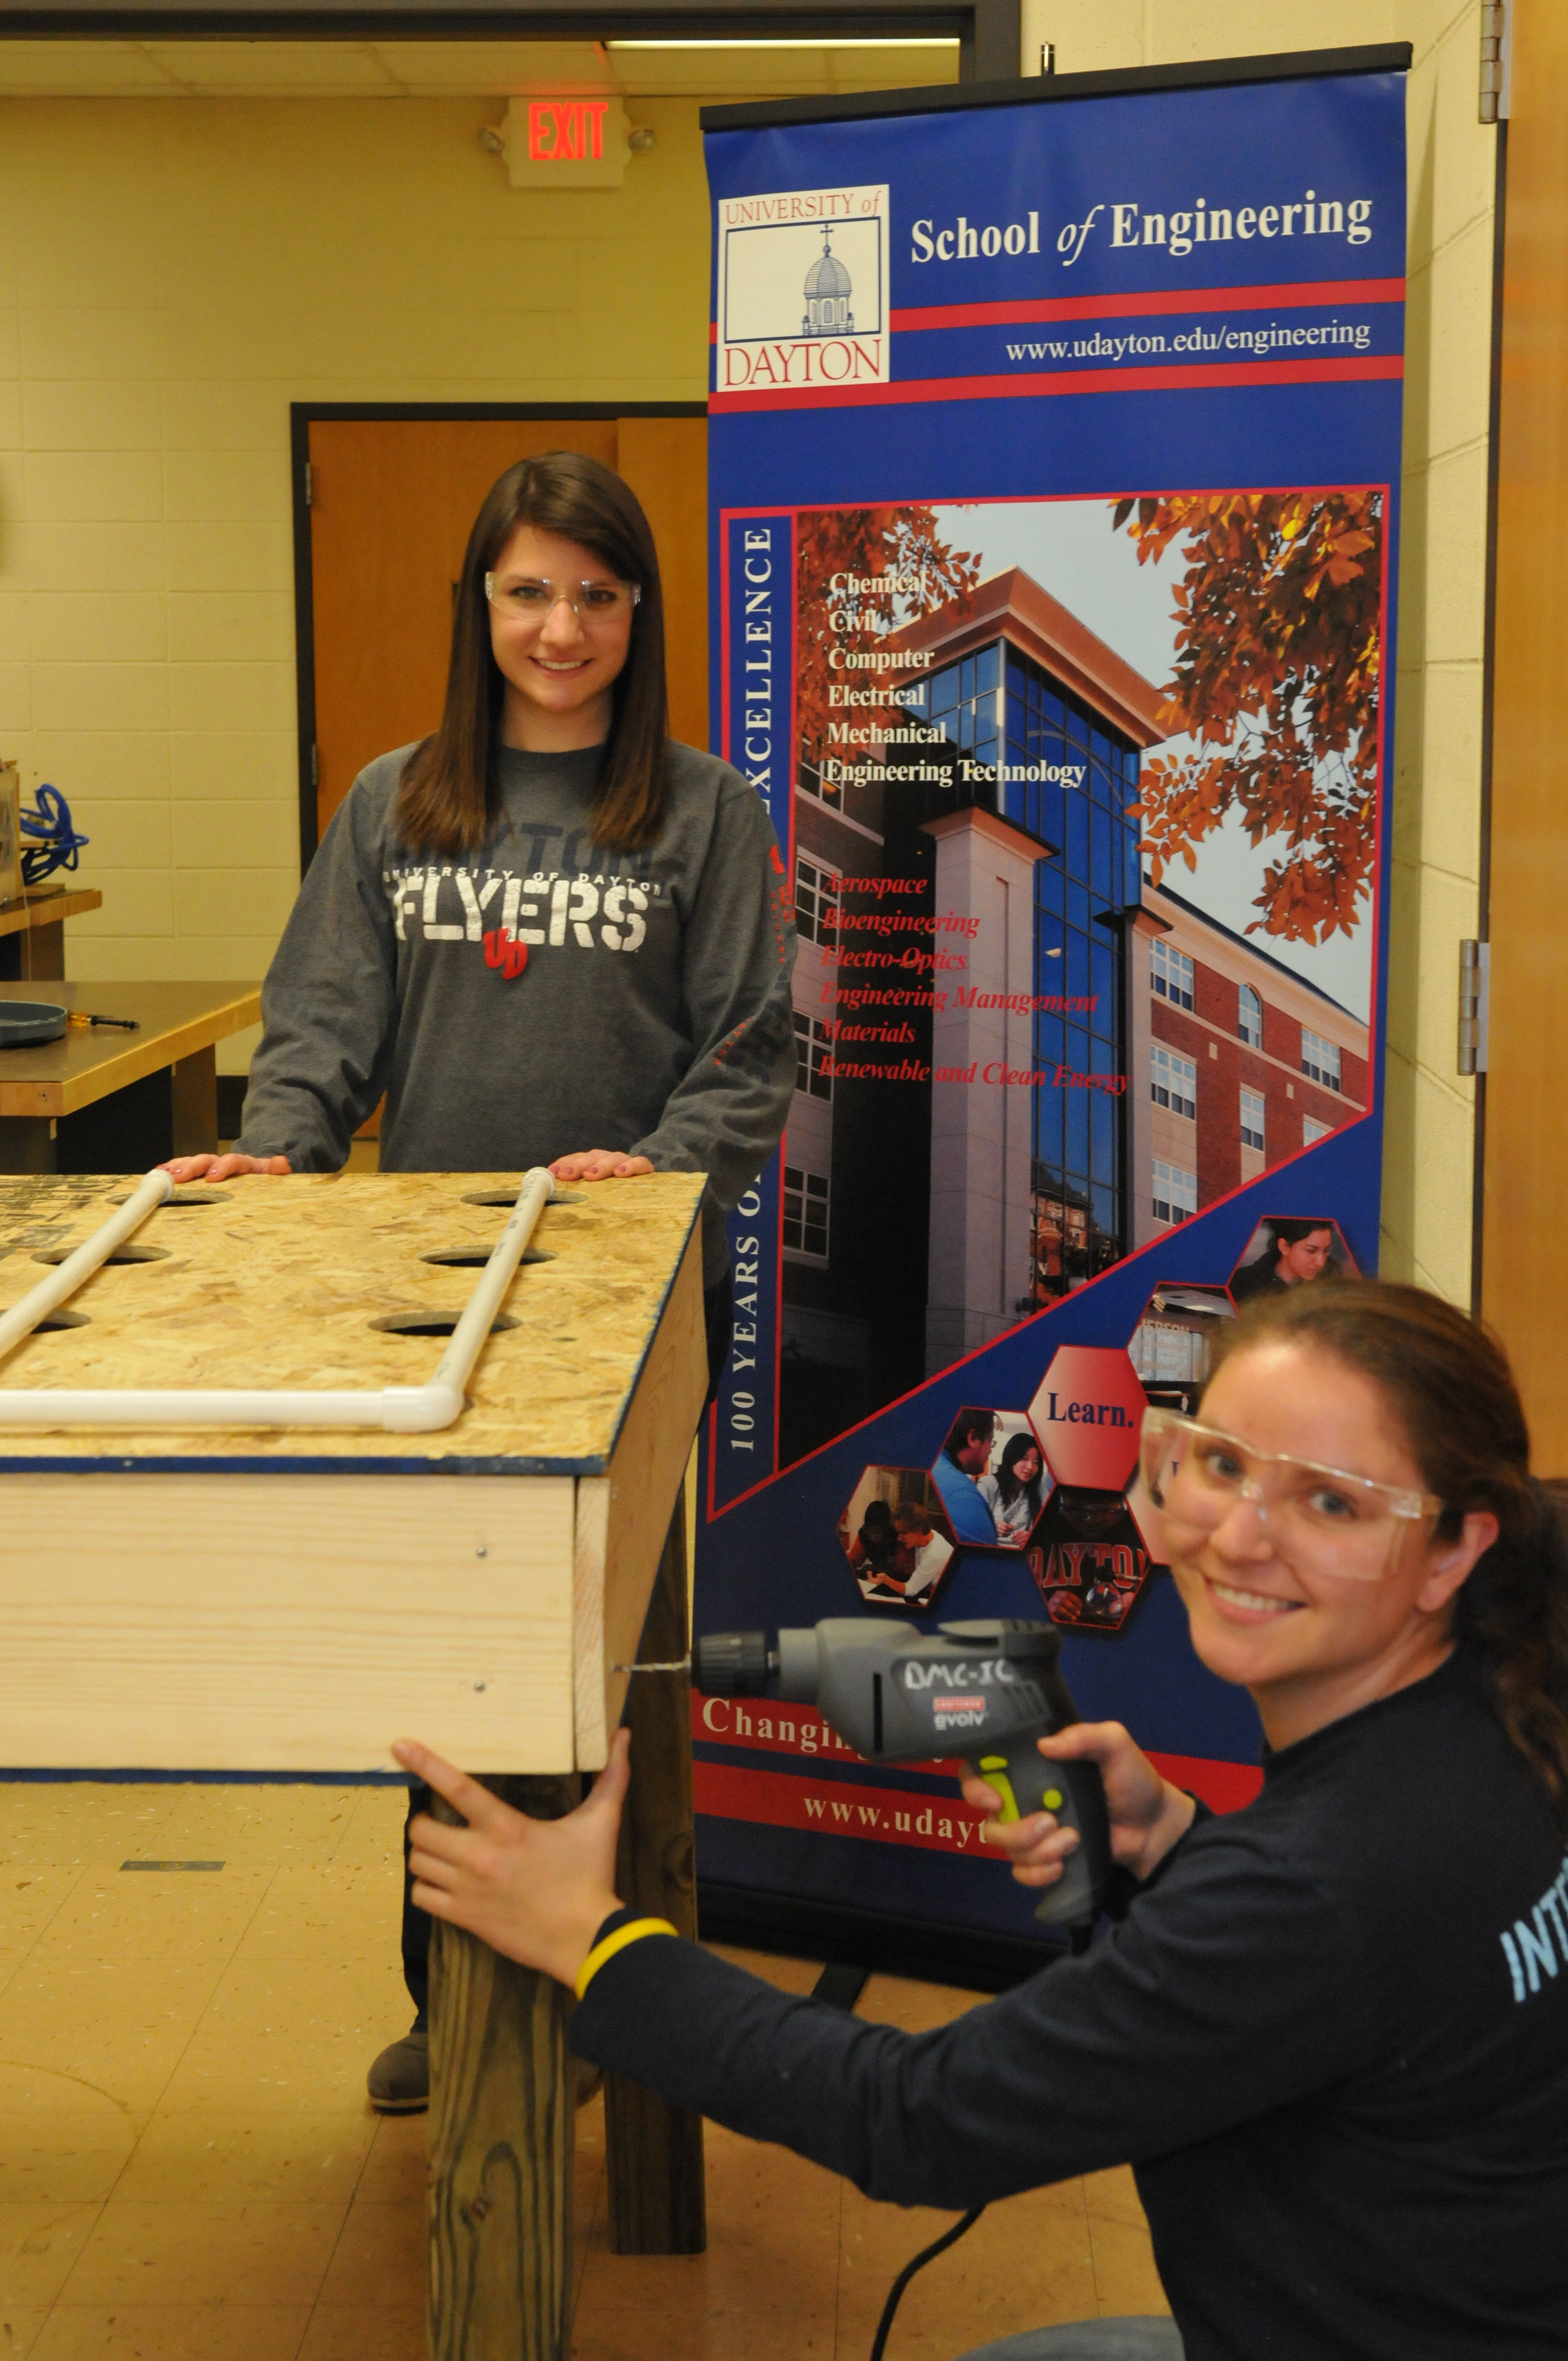 Summer Program - Engineering | University of Dayton: Women in Engineering Summer Camp